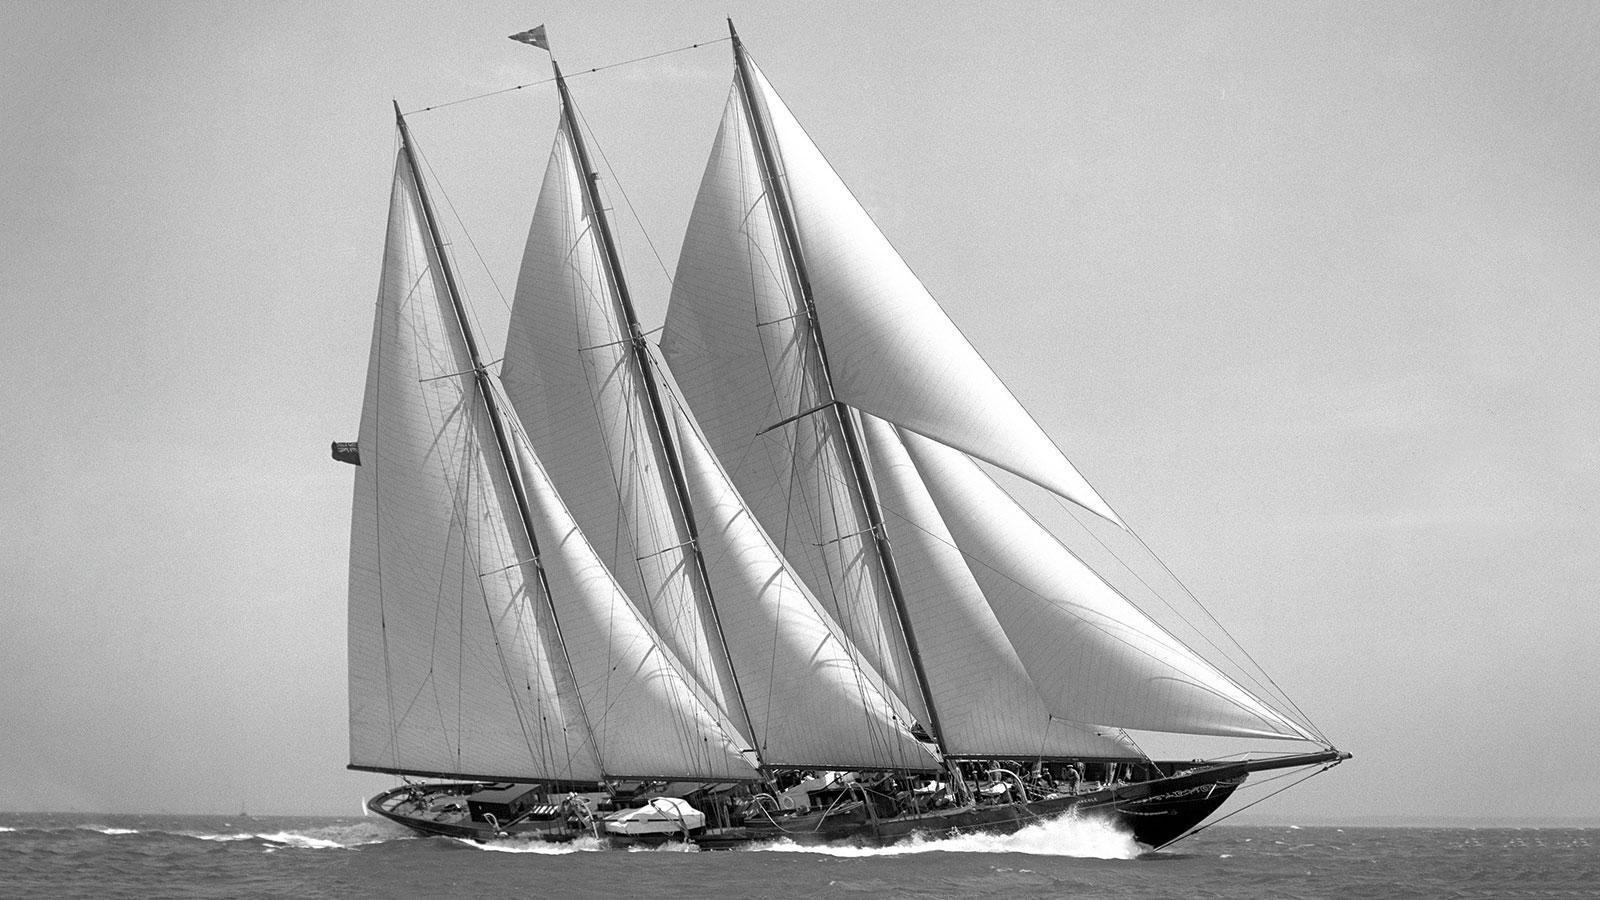 SiKVvr4RAyyegQNsbAoh_Creole-1939-2560x1440